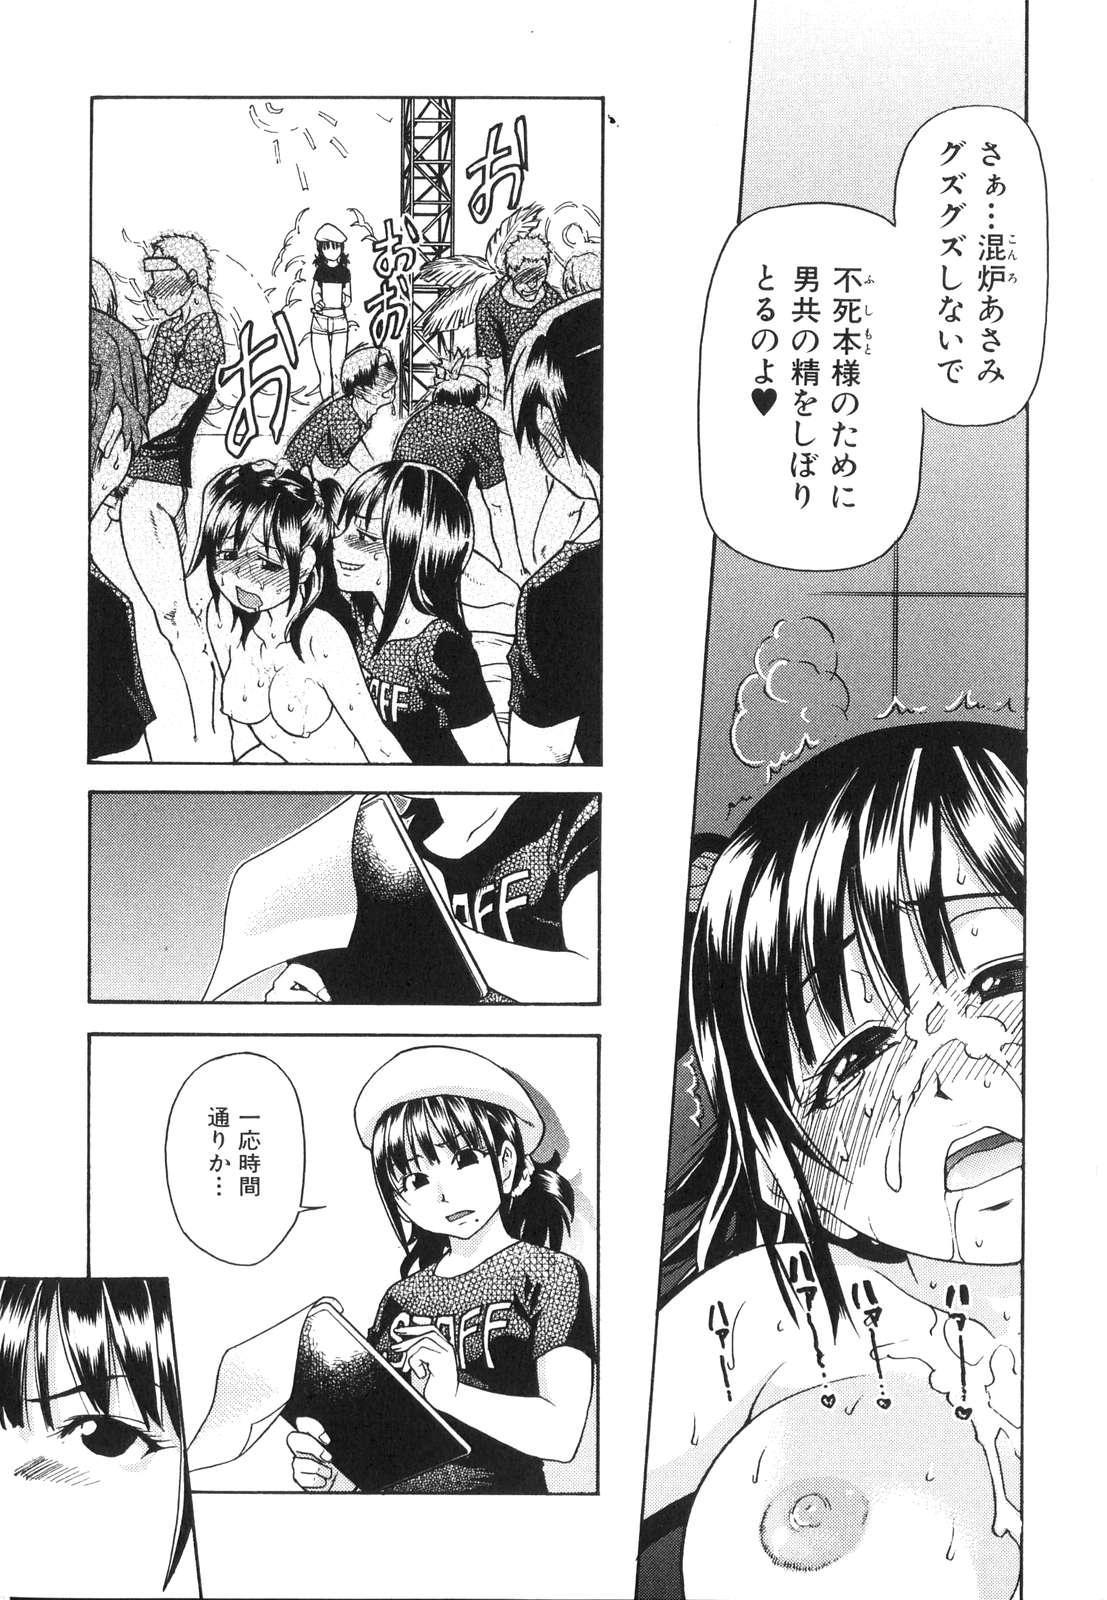 Shining Musume. 6. Rainbow Six 12